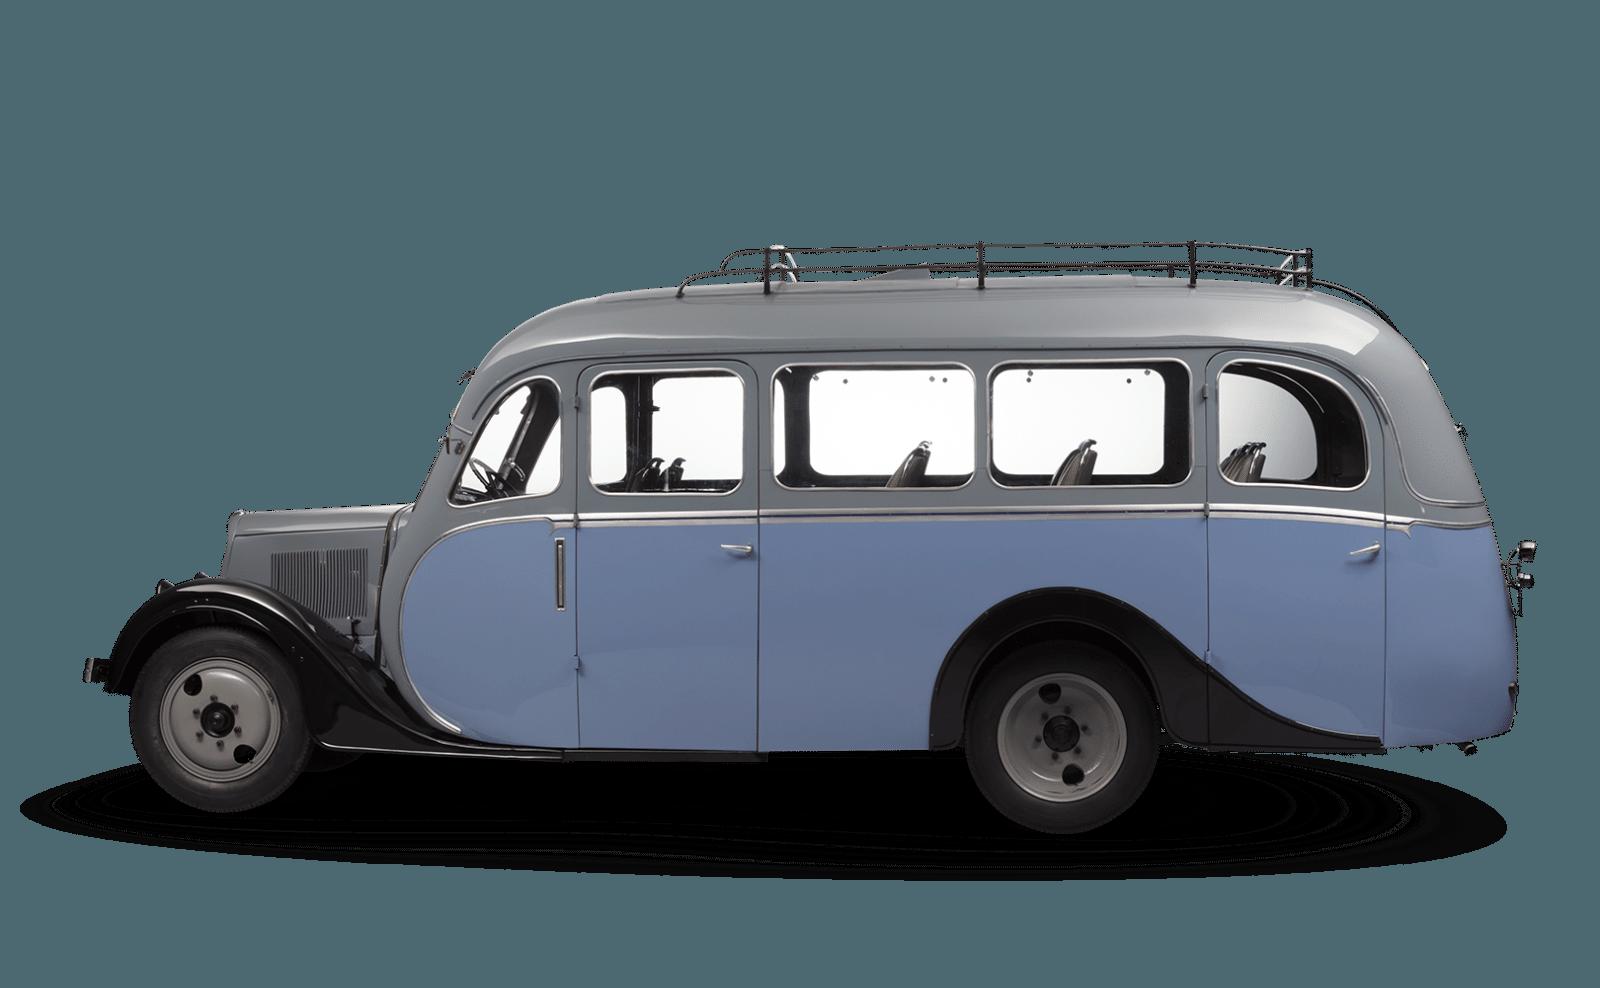 Citroen bus u23 -